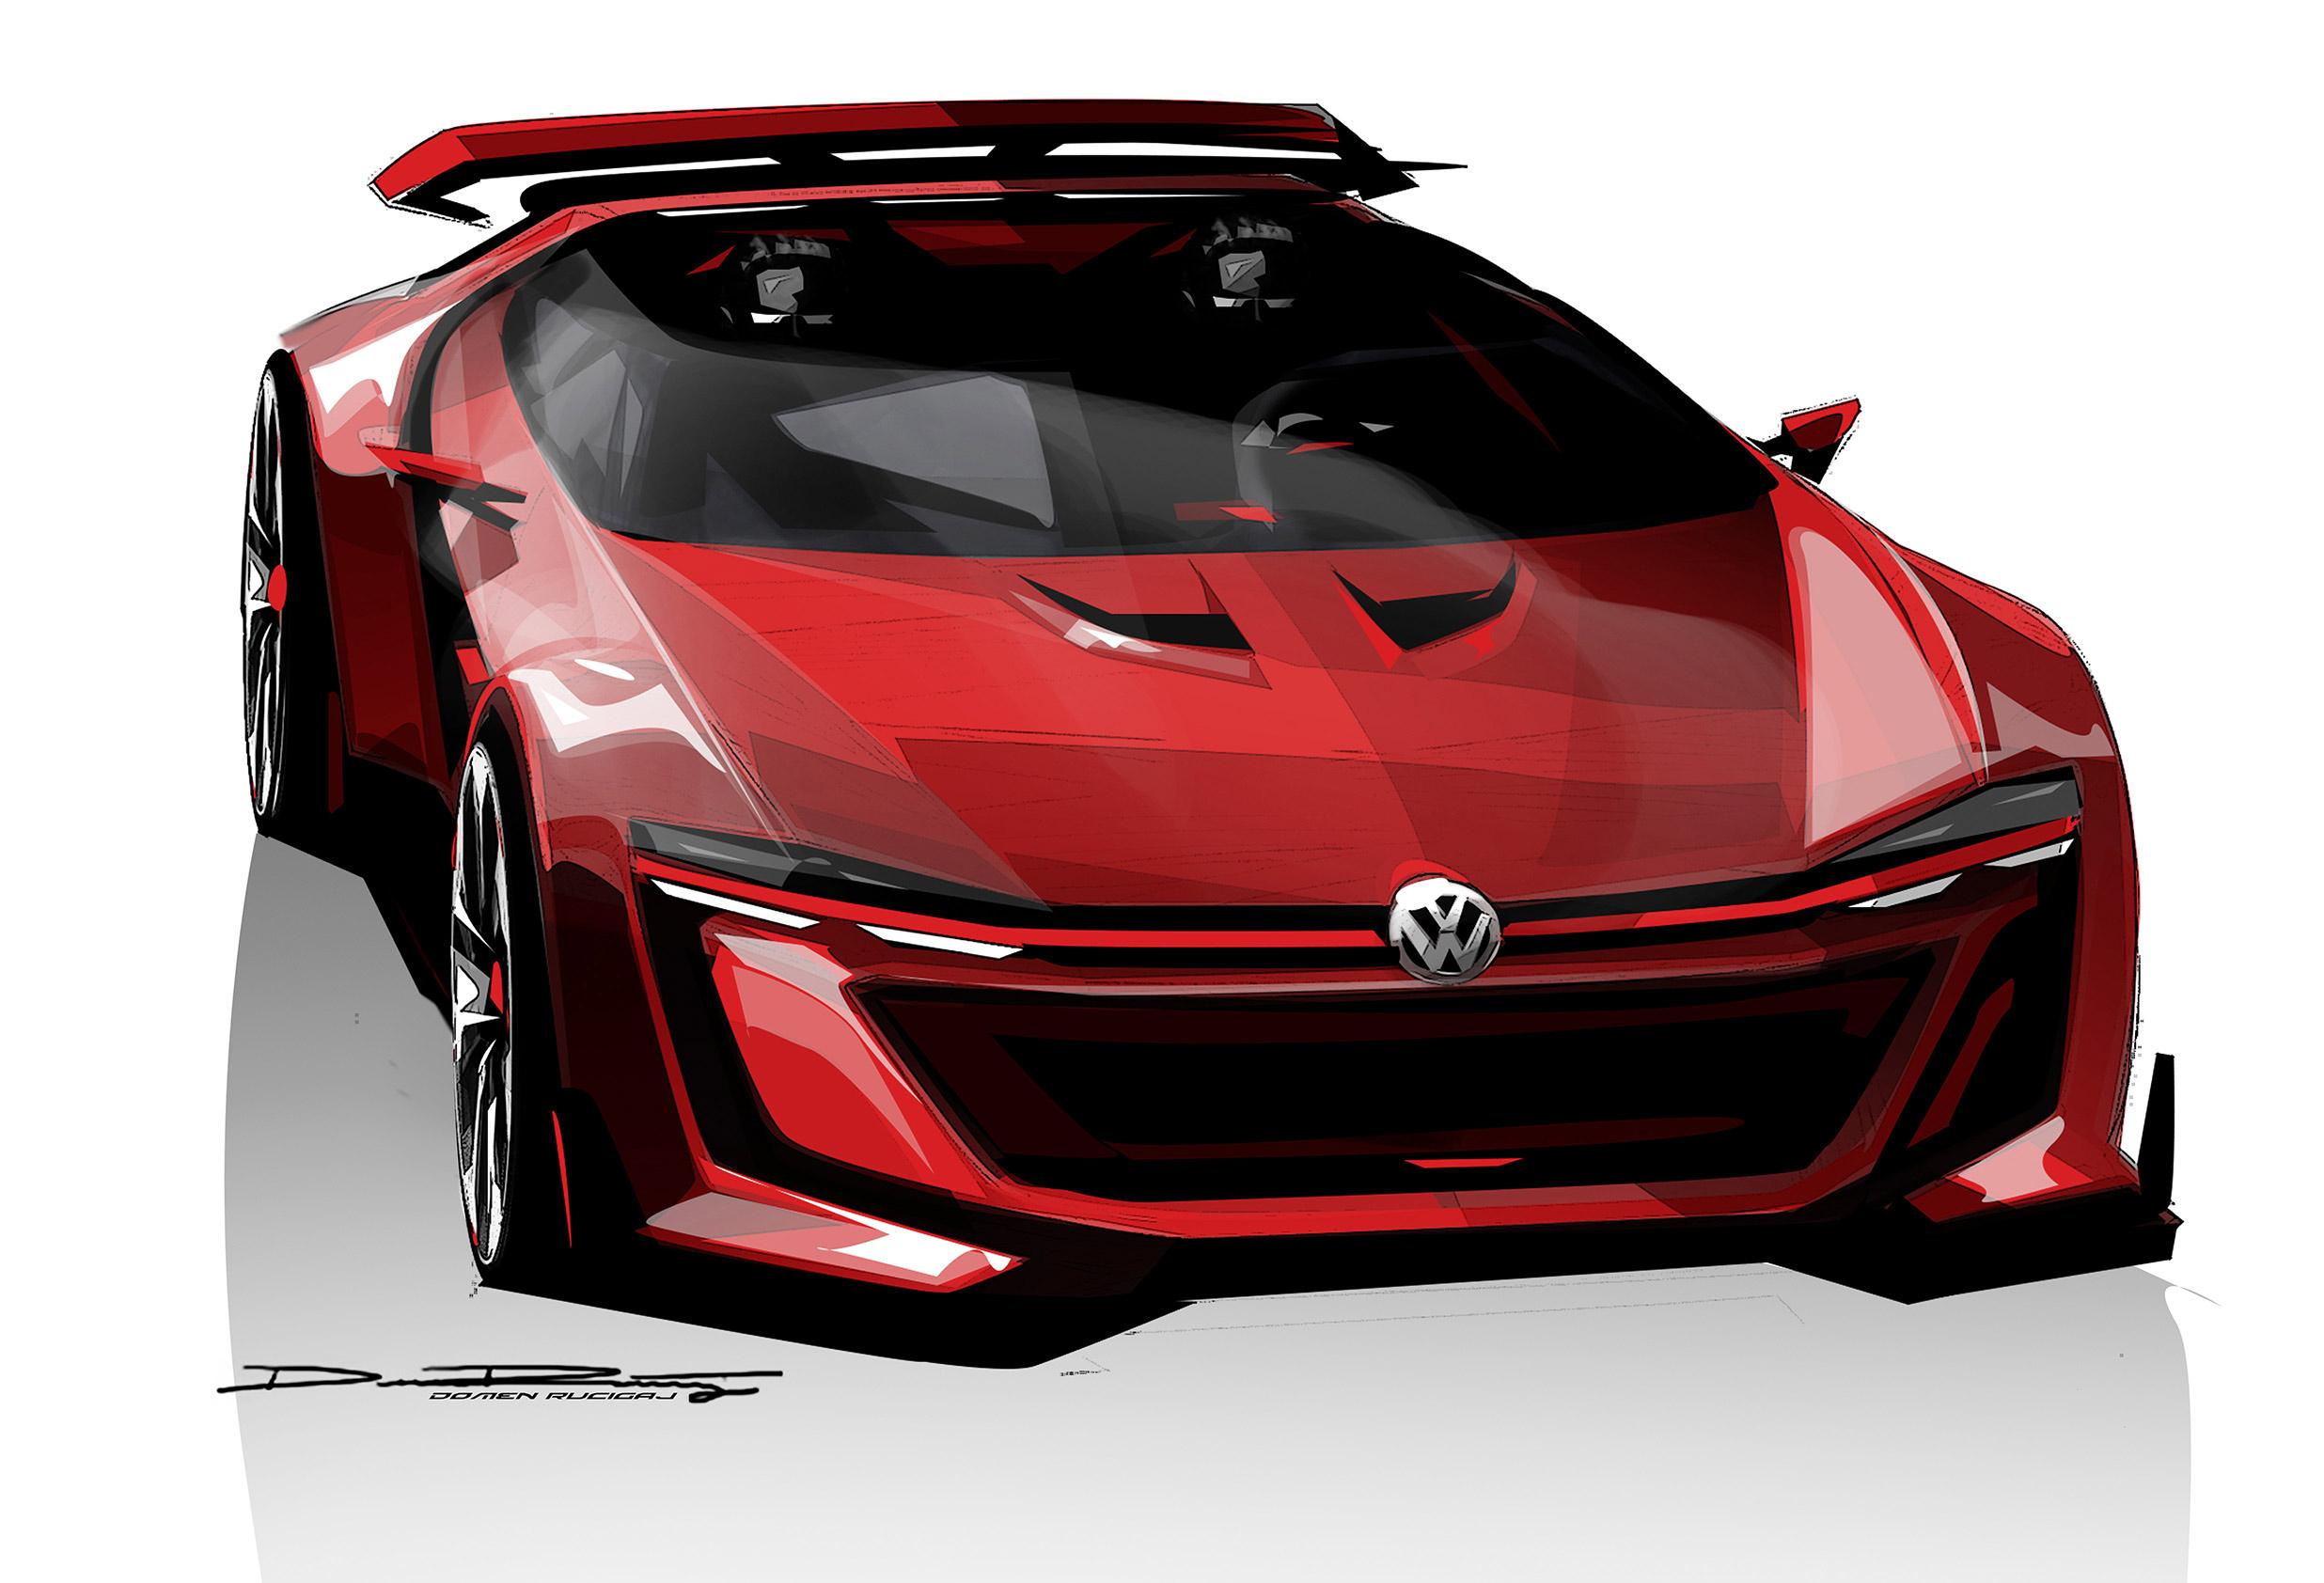 volkswagen-design-vision-gti-gran-turismo-001